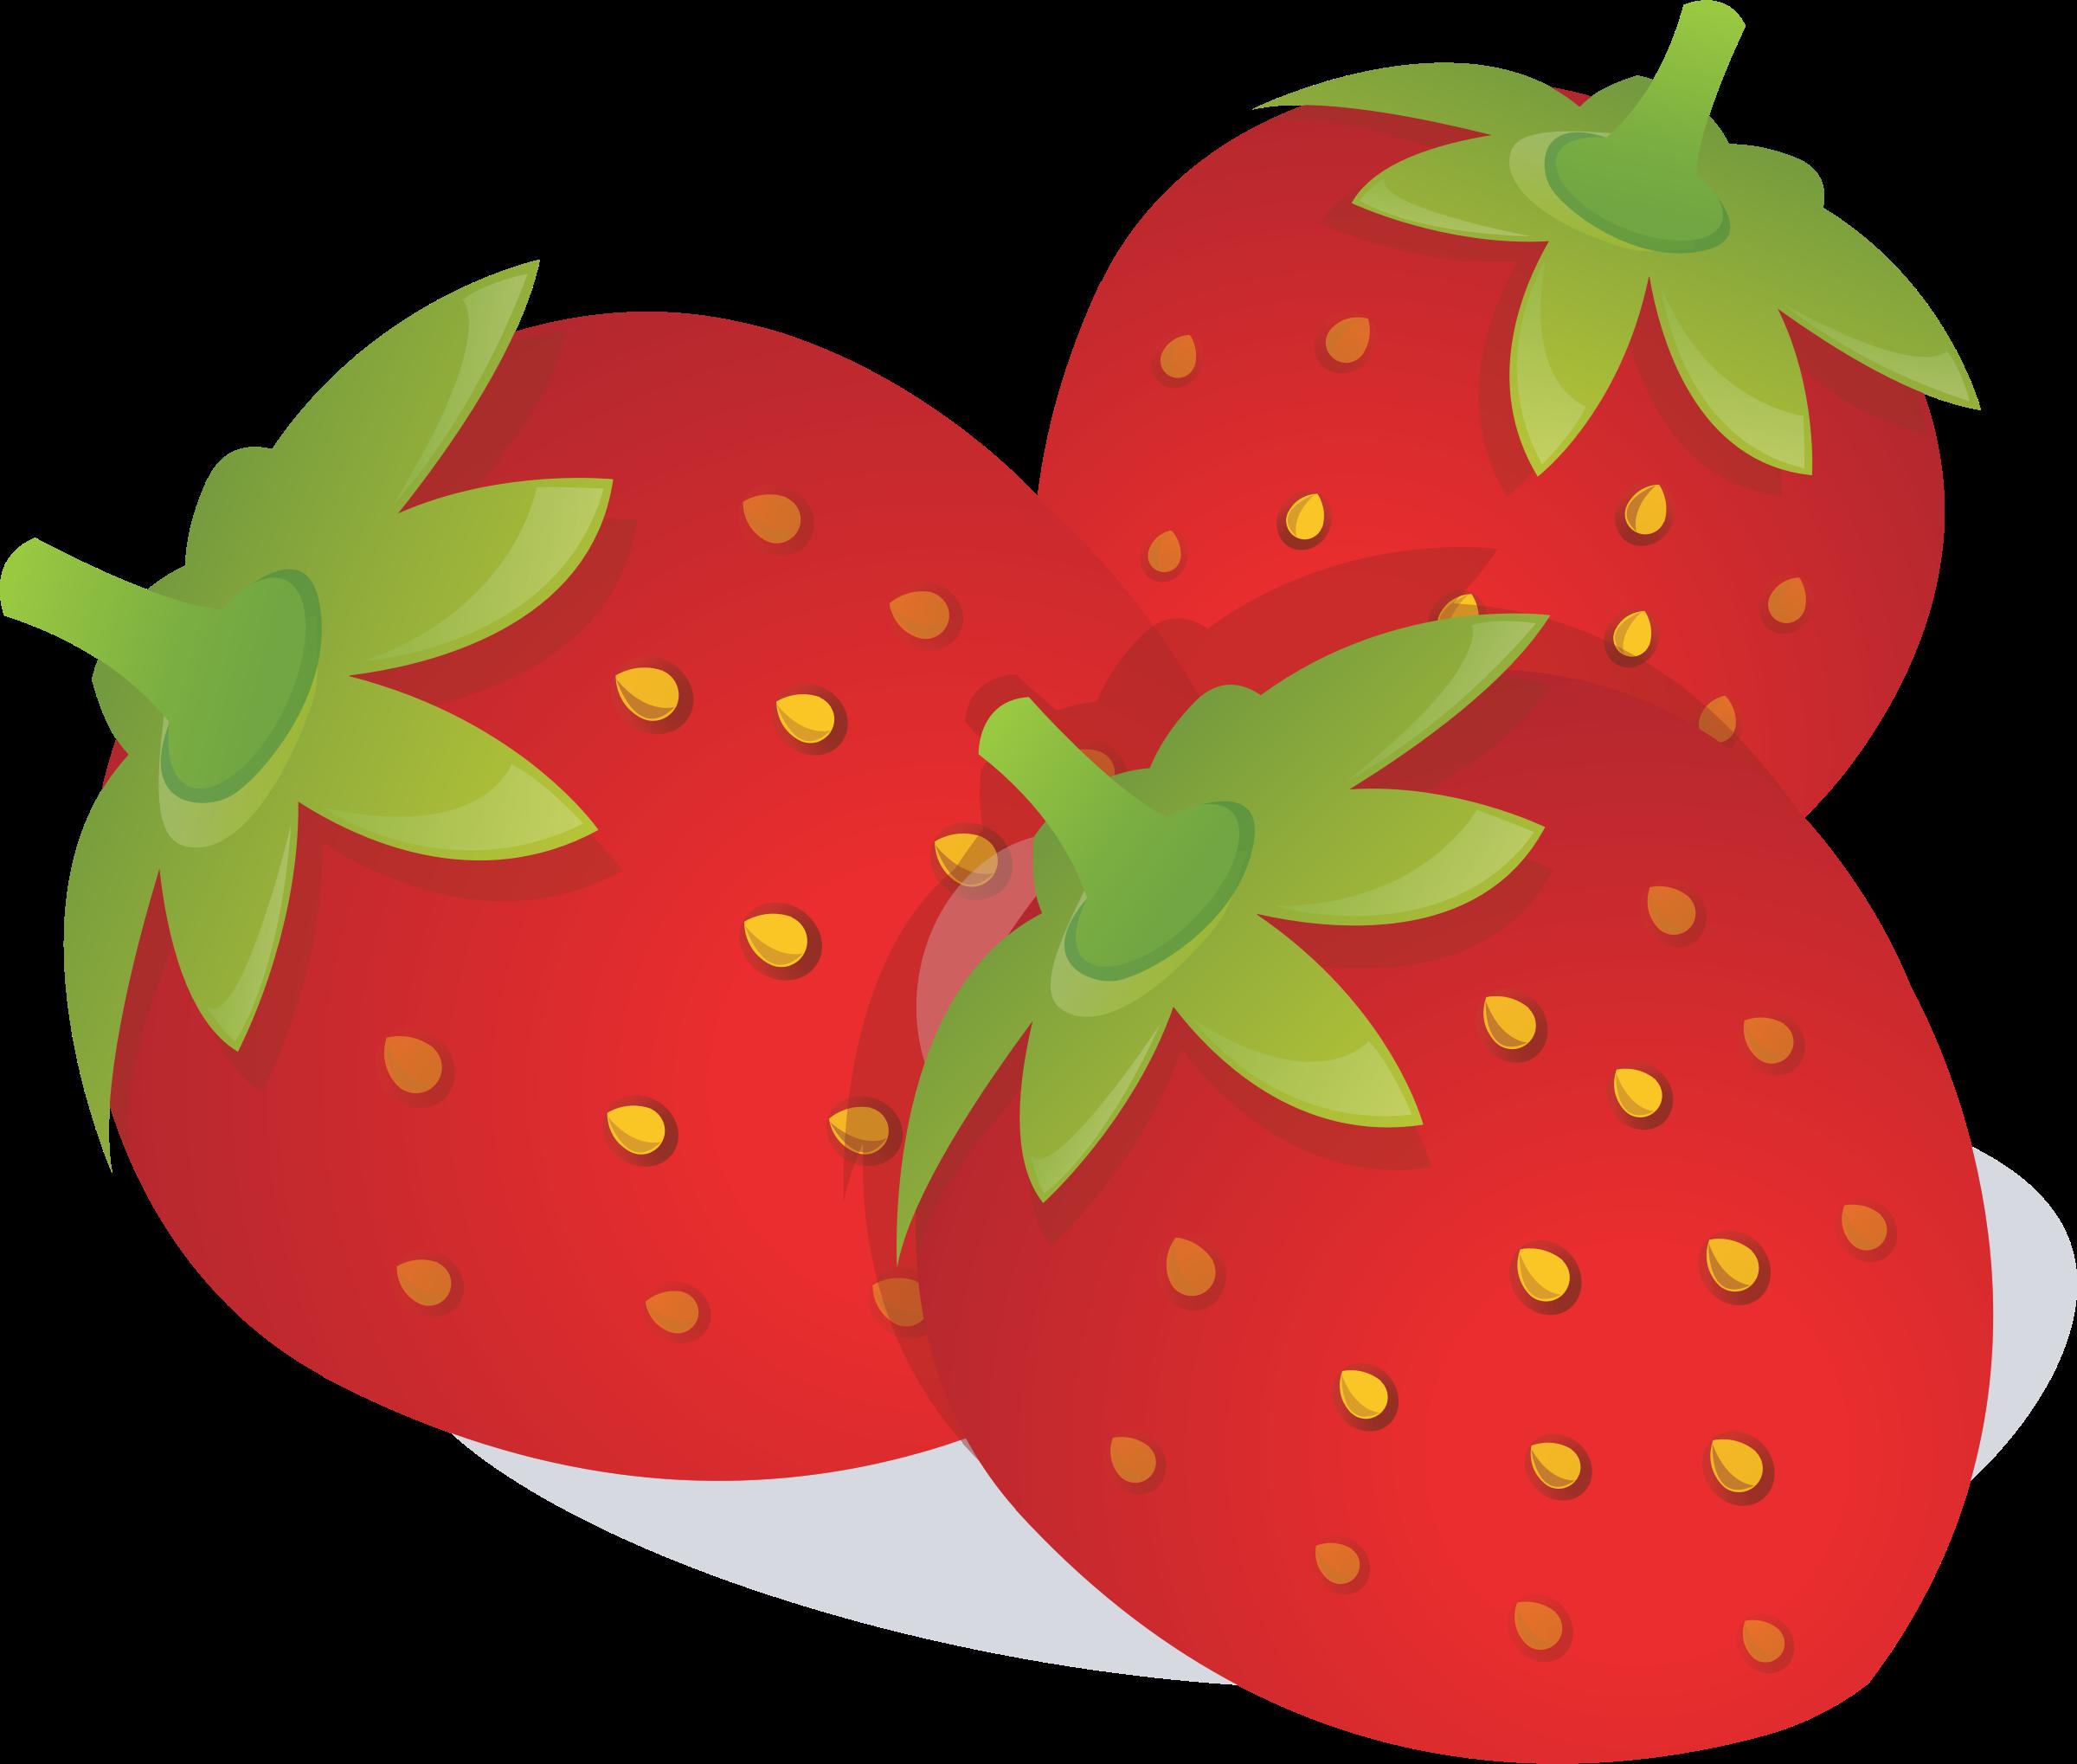 Strawberries clipart stem.